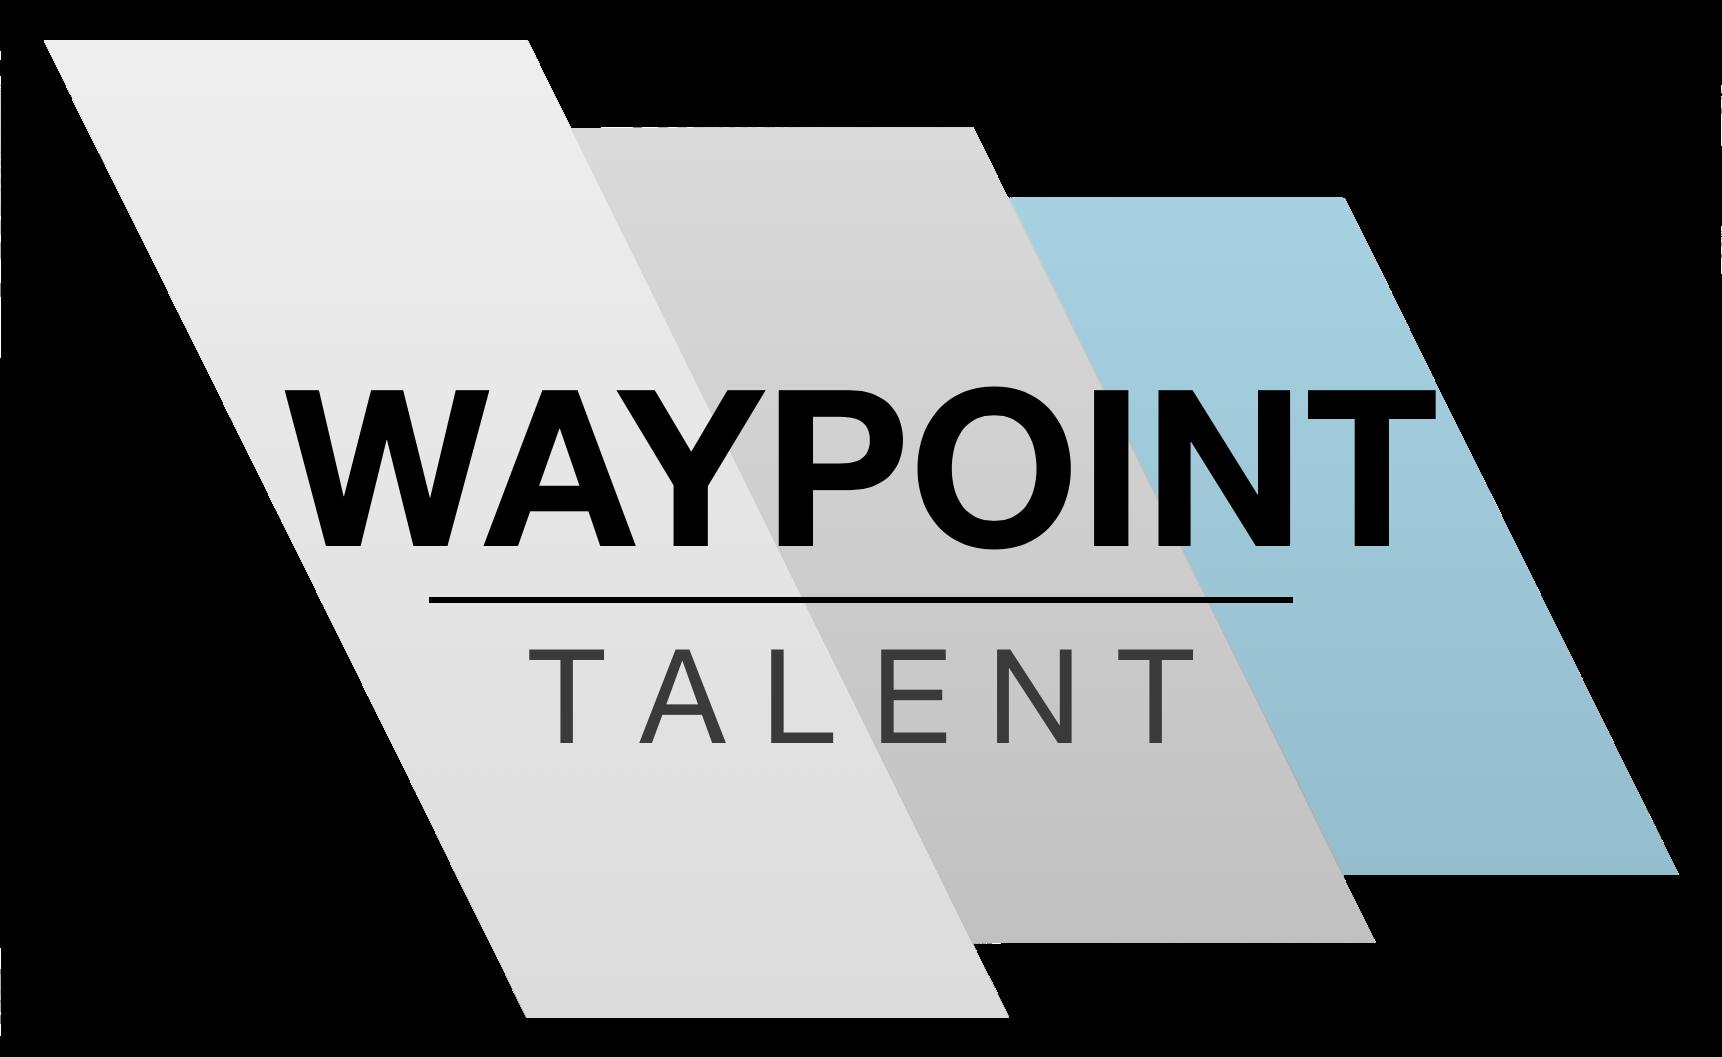 Waypoint Talent